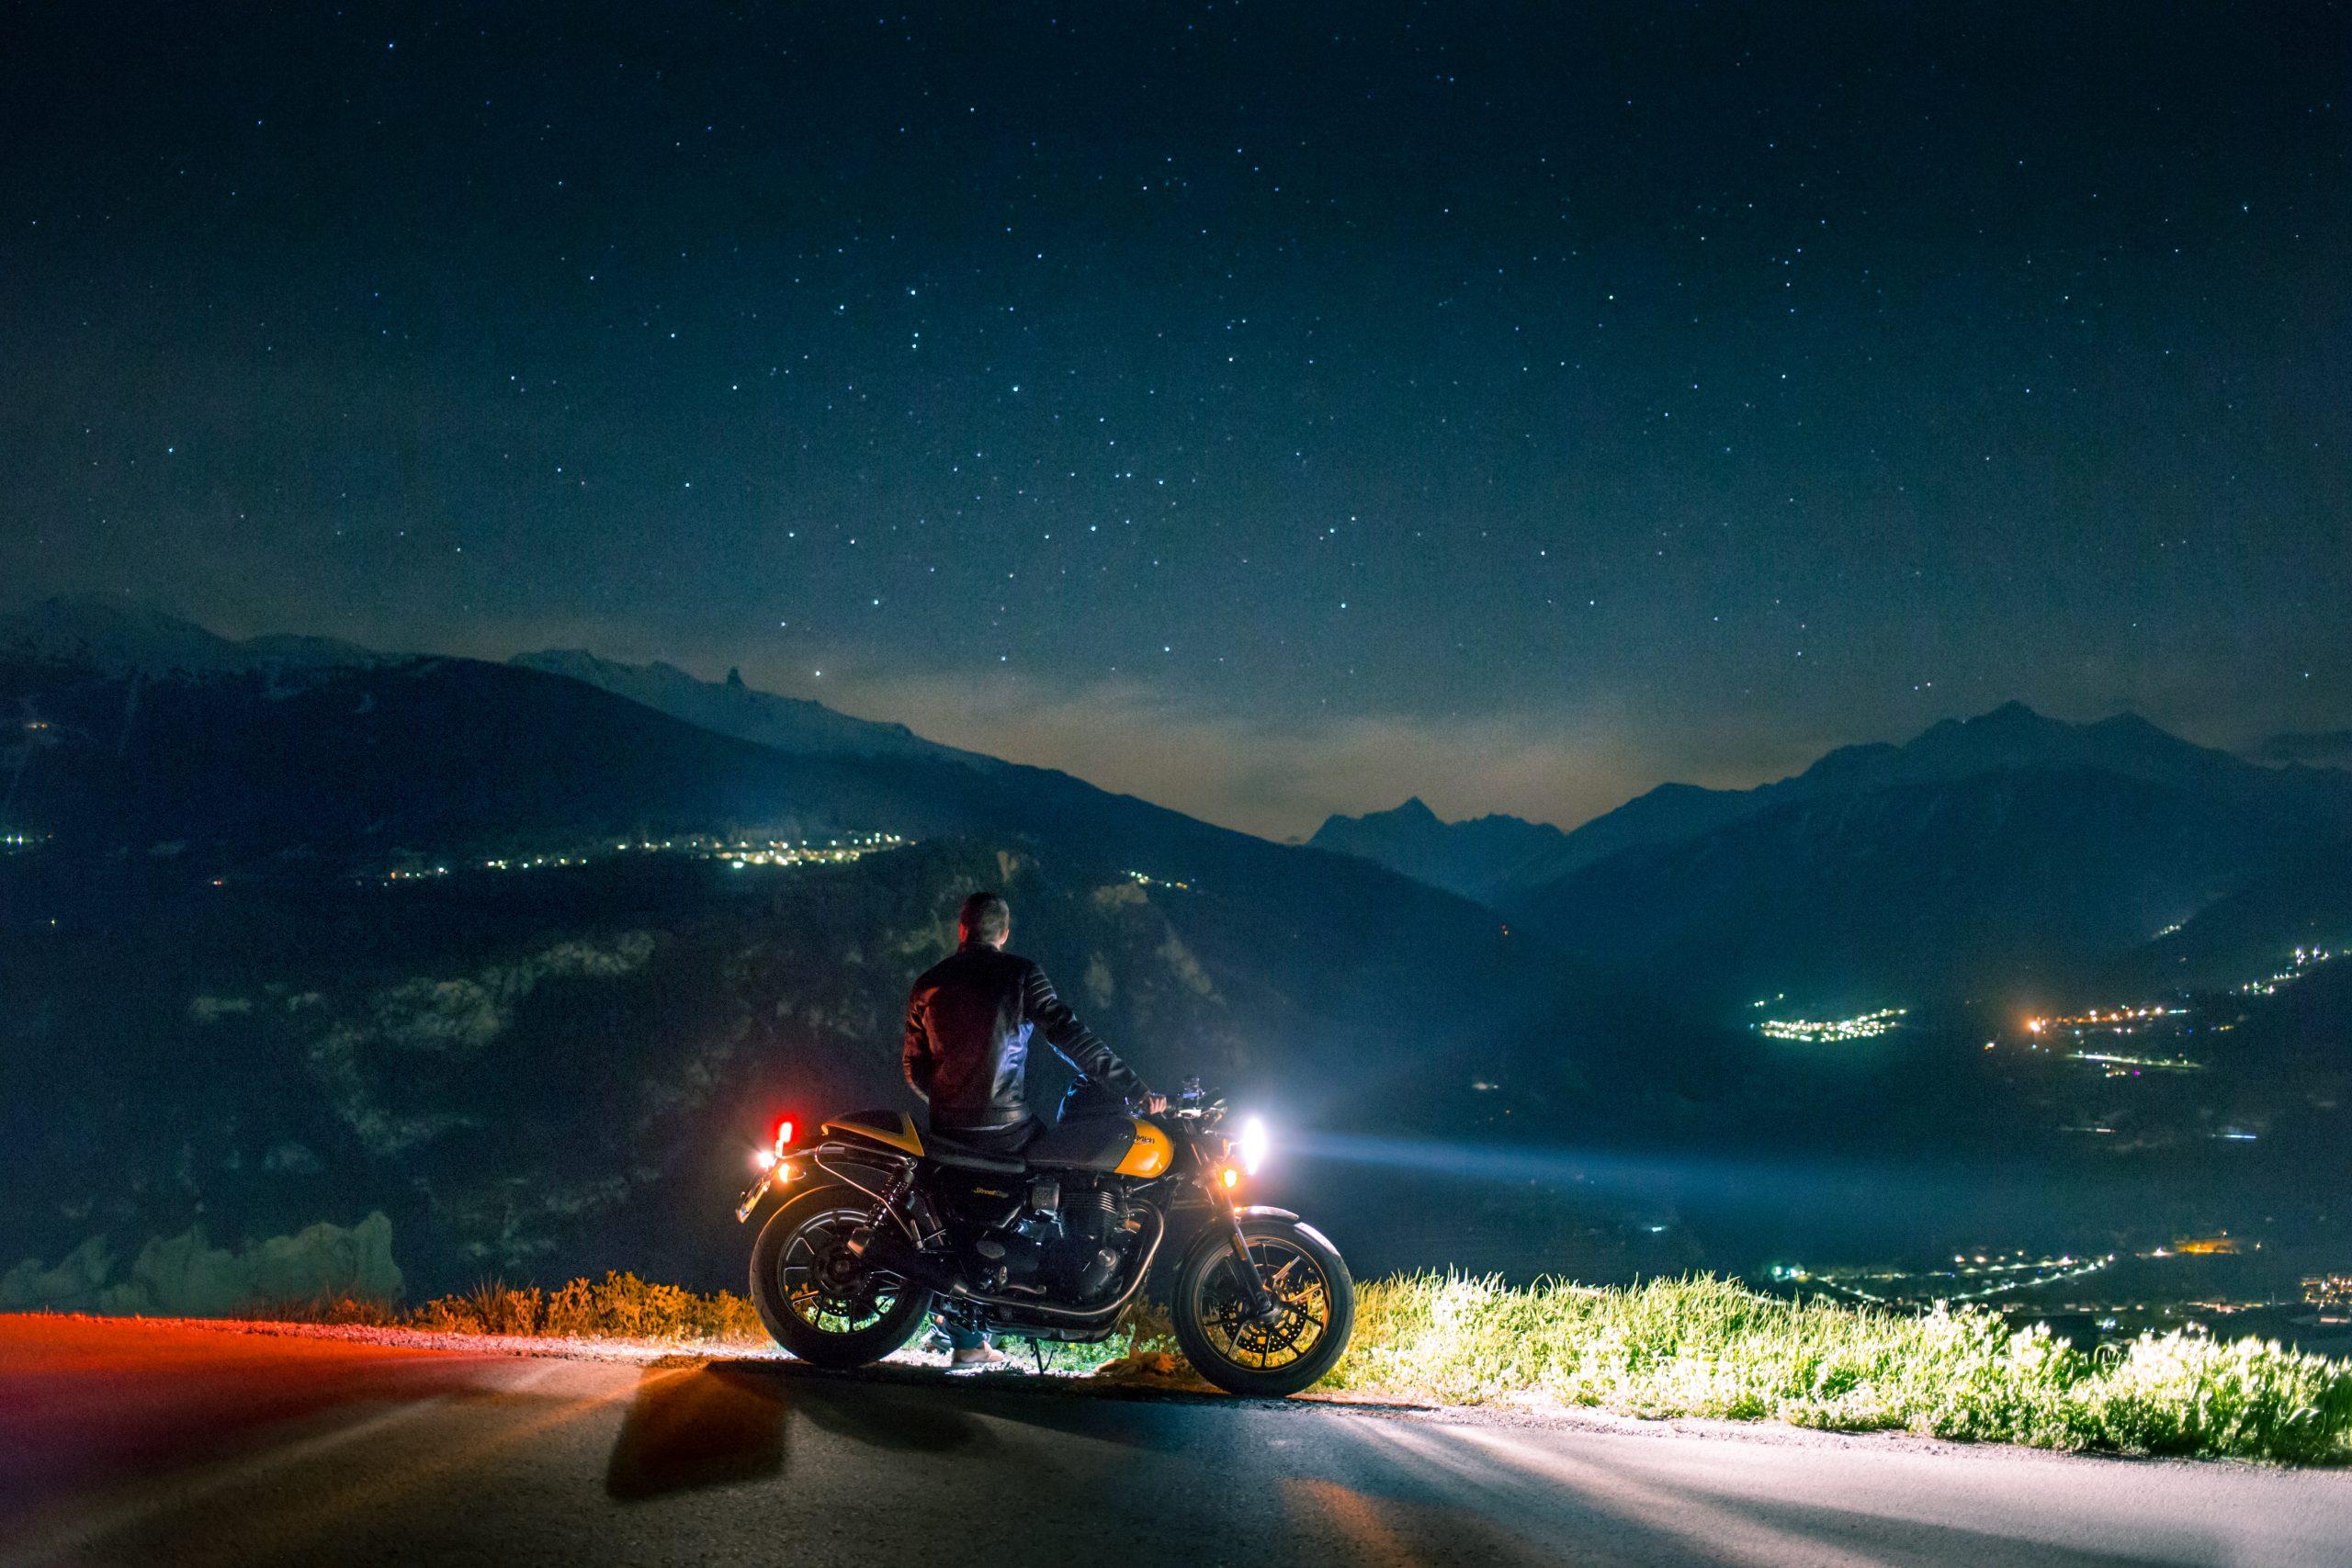 wallpaper Man siting on motorcycle at night